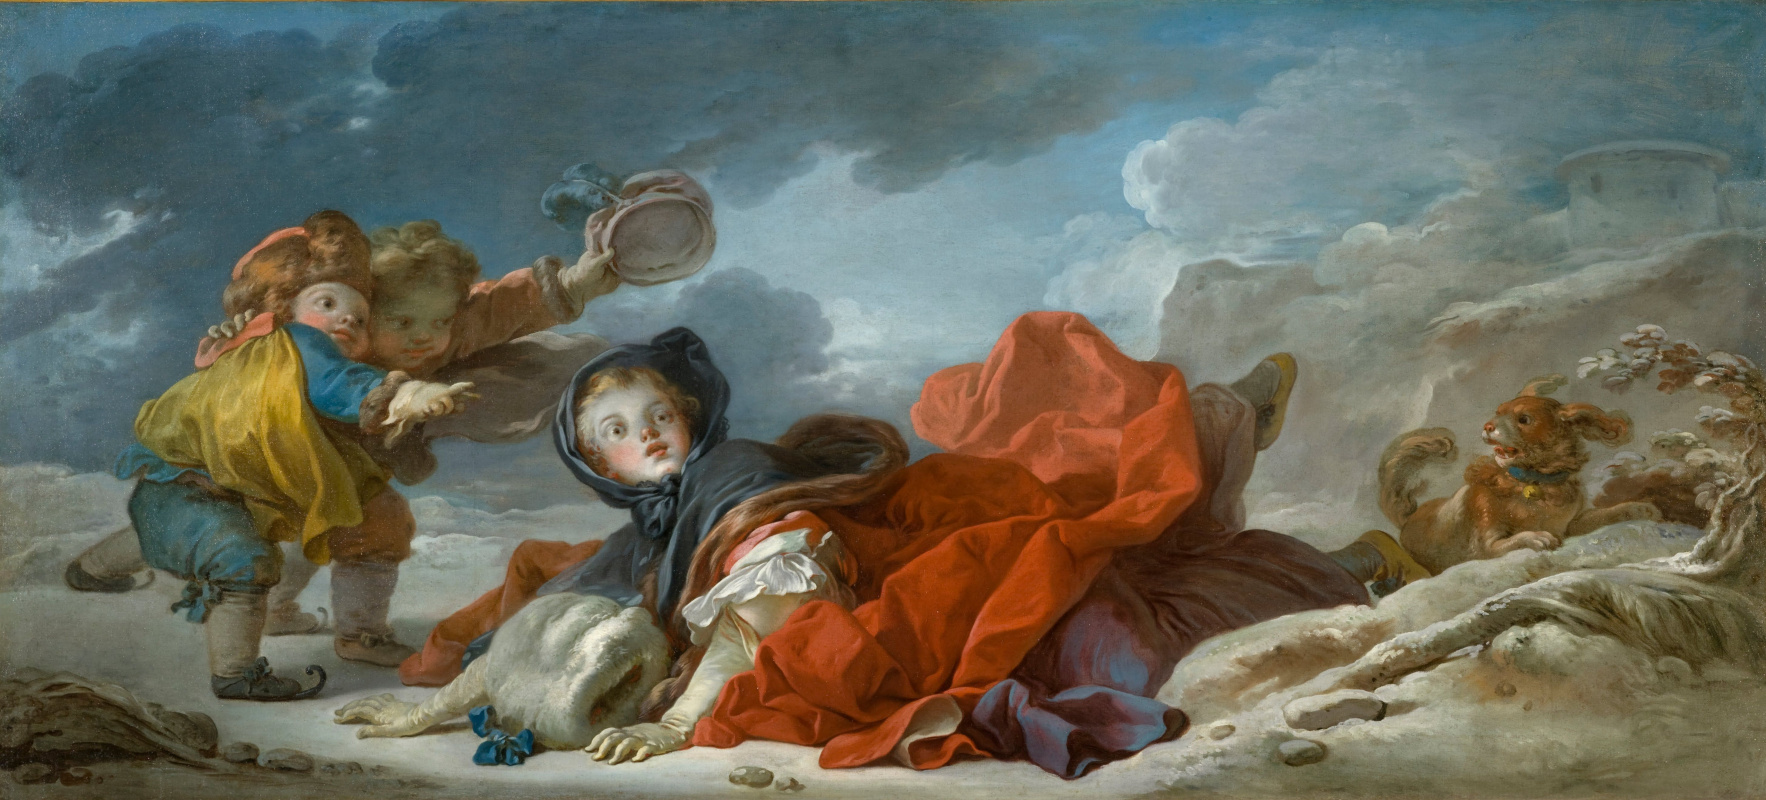 Jean-Honore Fragonard. Winter